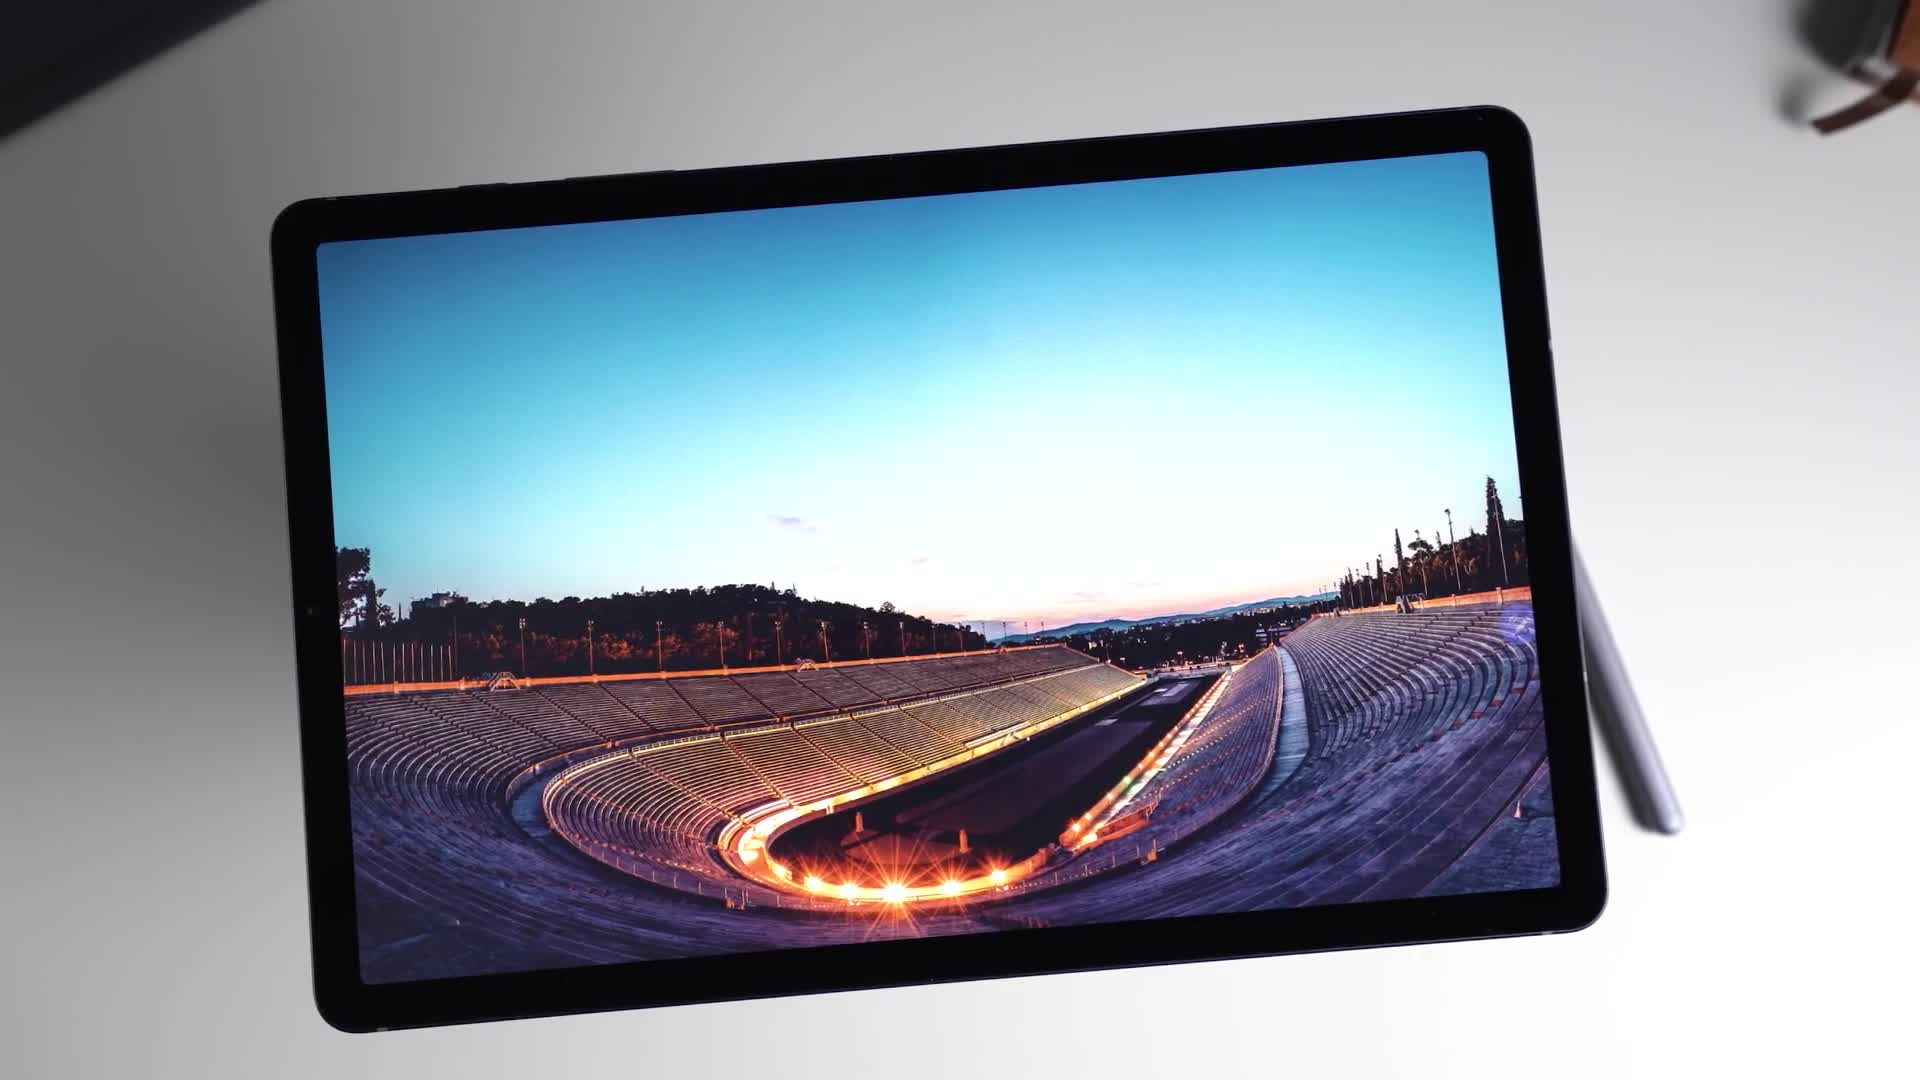 Android, Tablet, Samsung, Samsung Galaxy, Test, Galaxy, Andrzej Tokarski, Tabletblog, Samsung Mobile, Android 9.0, Android 9.0 Pie, S Pen, Samsung Galaxy Tab S6, Galaxy Tab S6